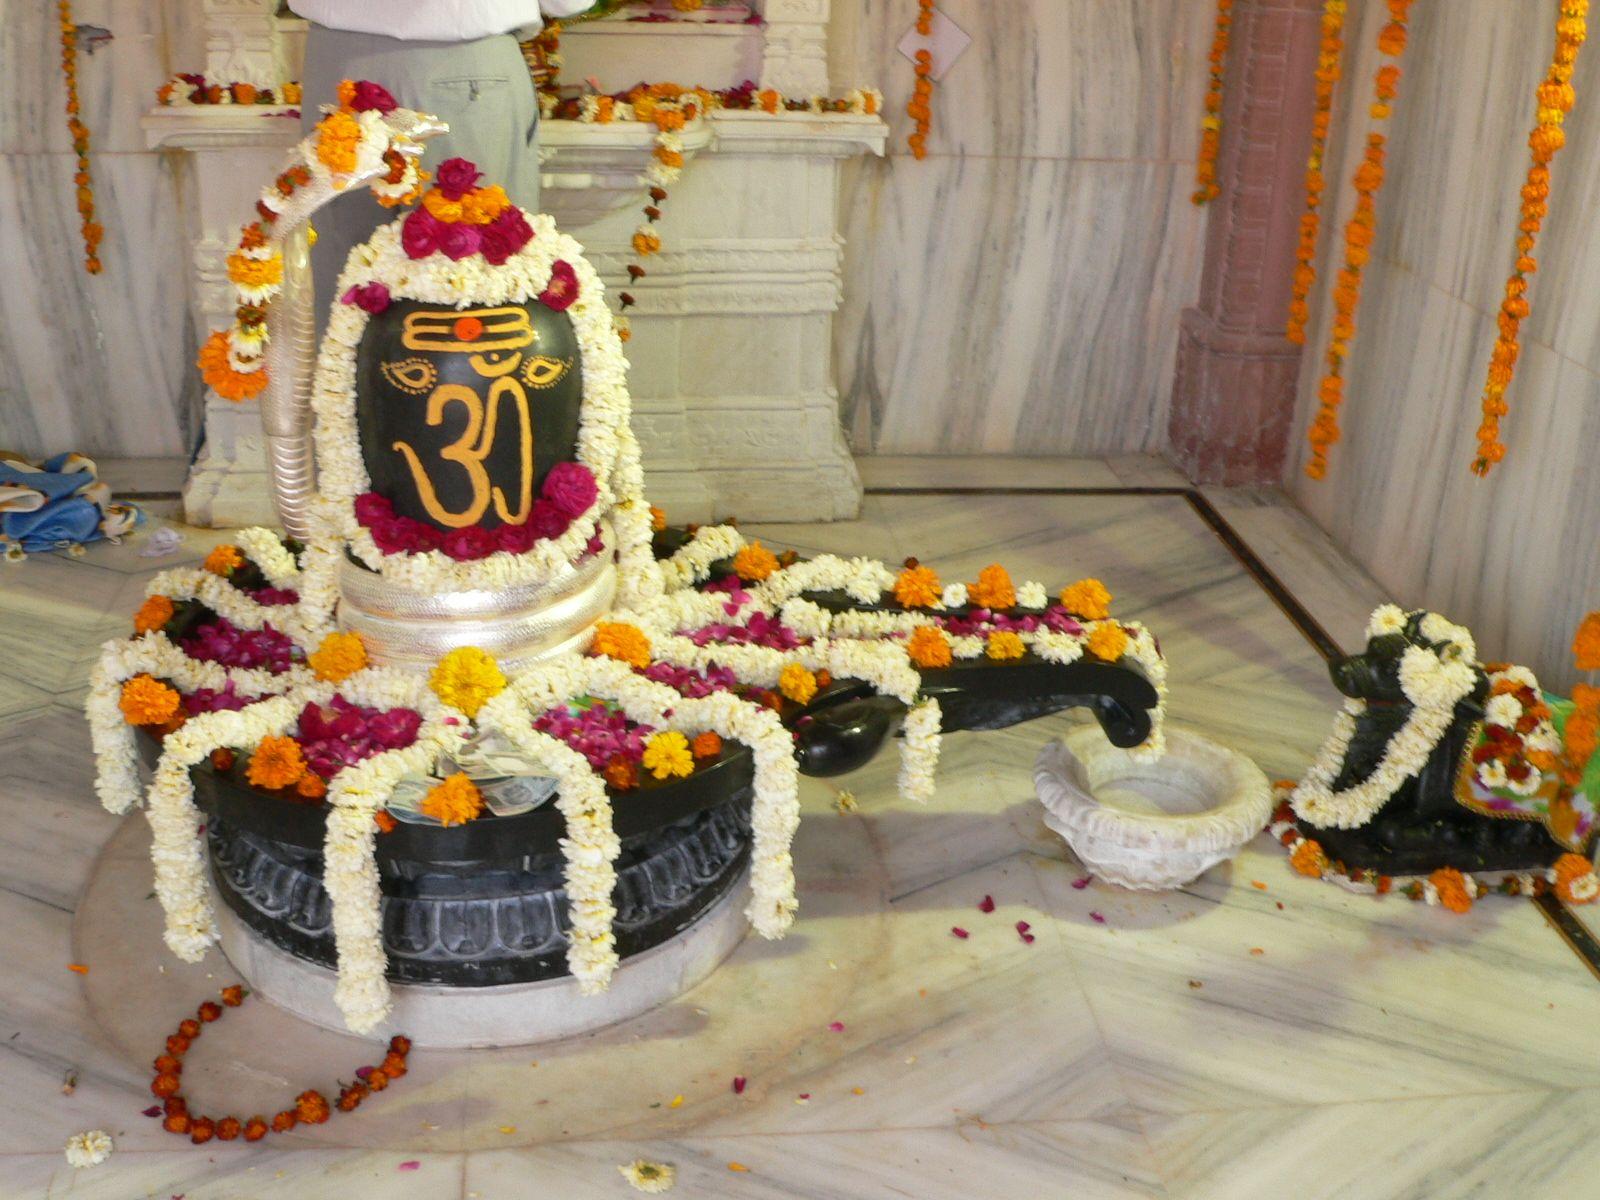 Download Free Spiritual Wallpapers Amazing Collection Of Full Screen Spiritual Hd Wallpapers At 2880x1800 1920x1080 2560x16 Lord Shiva Shiva Shiva Wallpaper